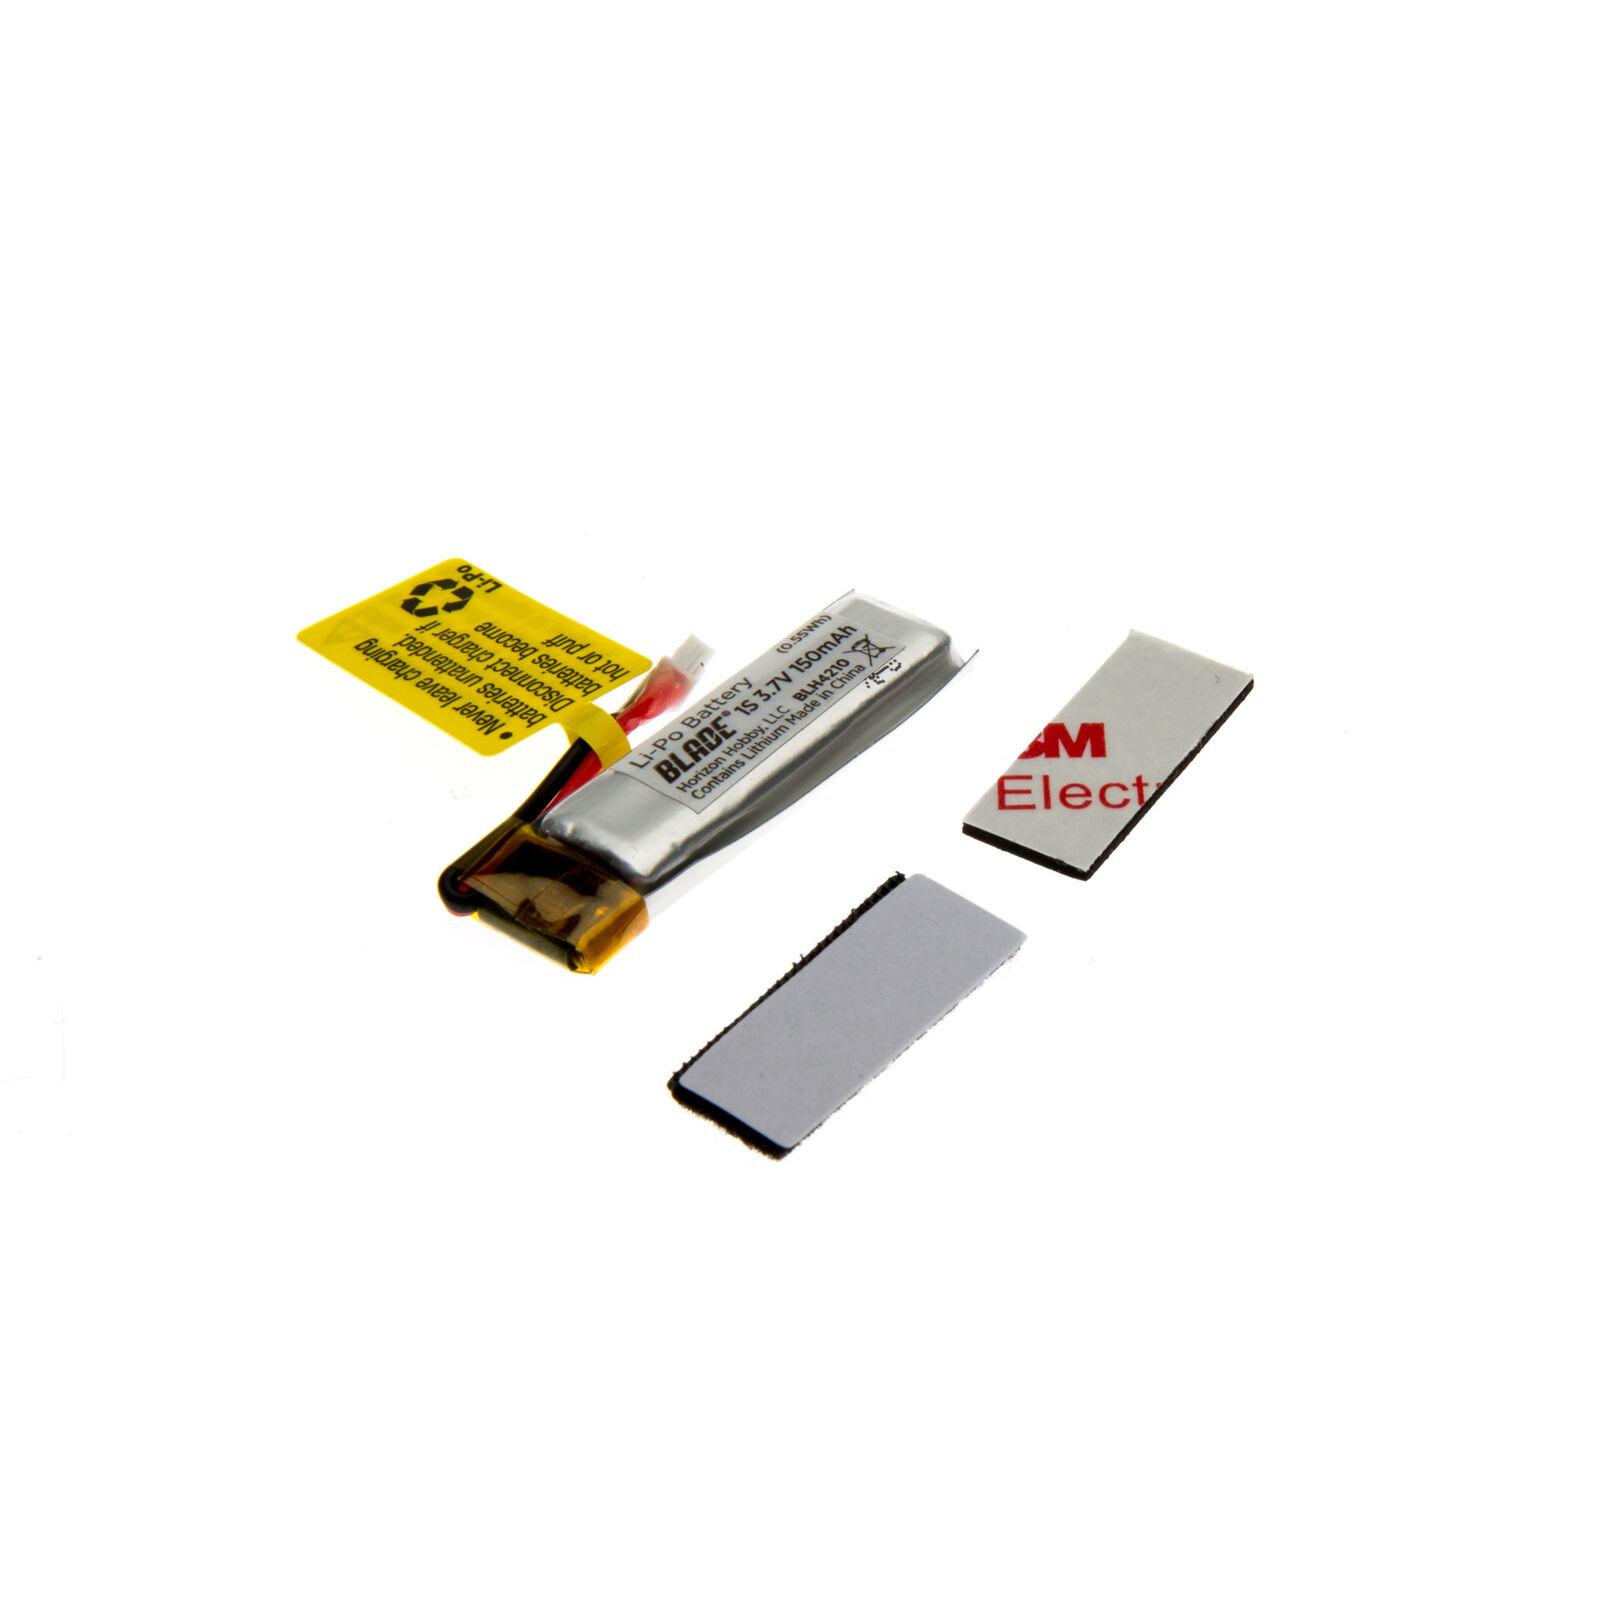 150mAh 1S 3.7V 45C LiPo Battery: PH 1.5 (Ultra Micro)